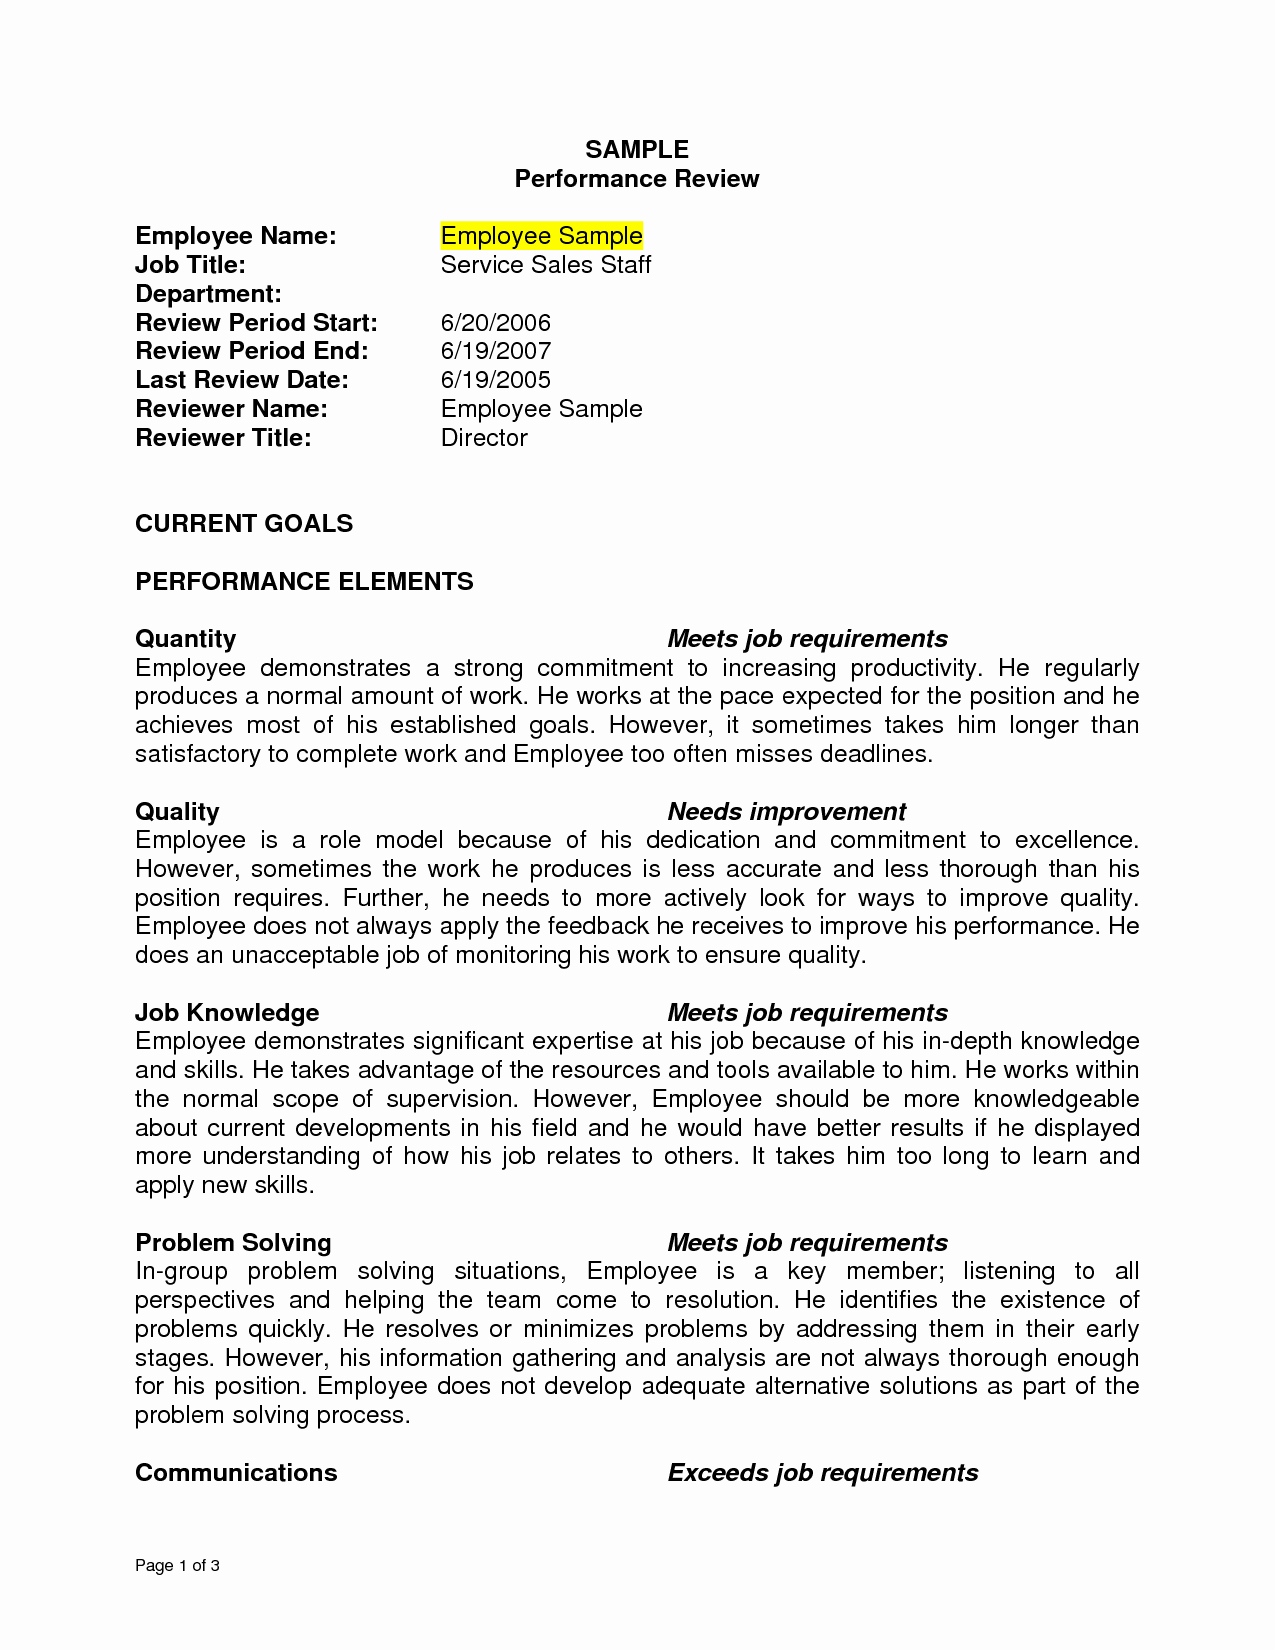 Accounting Career Goals Essay Inspirational Sample Performance Review Sample Performance Review